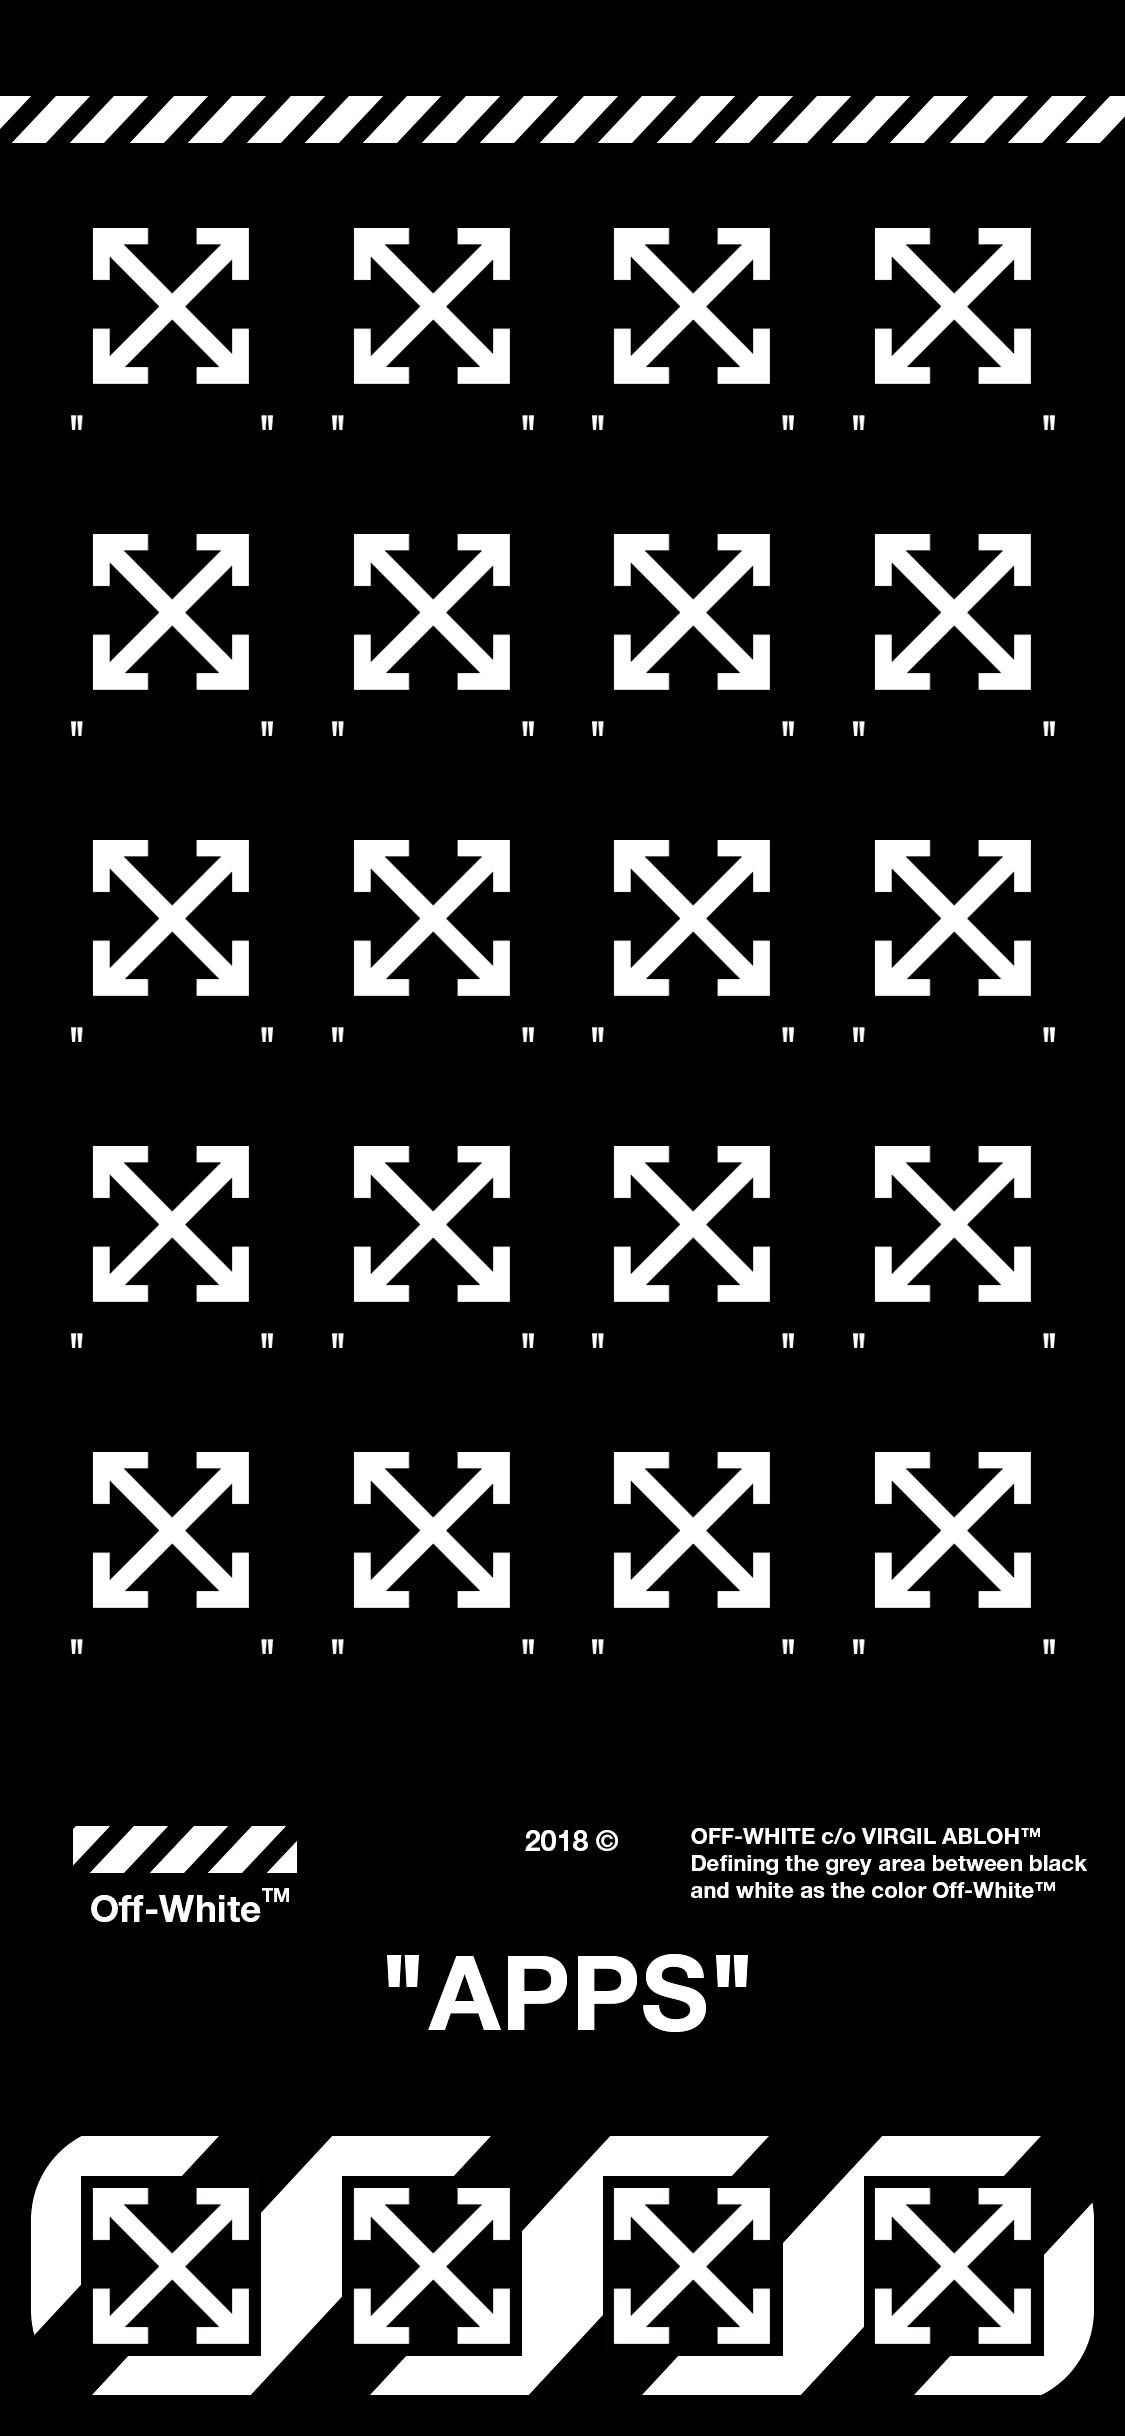 Off White Wallpaper 4k Iphone X Ideas In 2020 Iphone Wallpaper Off White Hypebeast Iphone Wallpaper Iphone Lockscreen Wallpaper